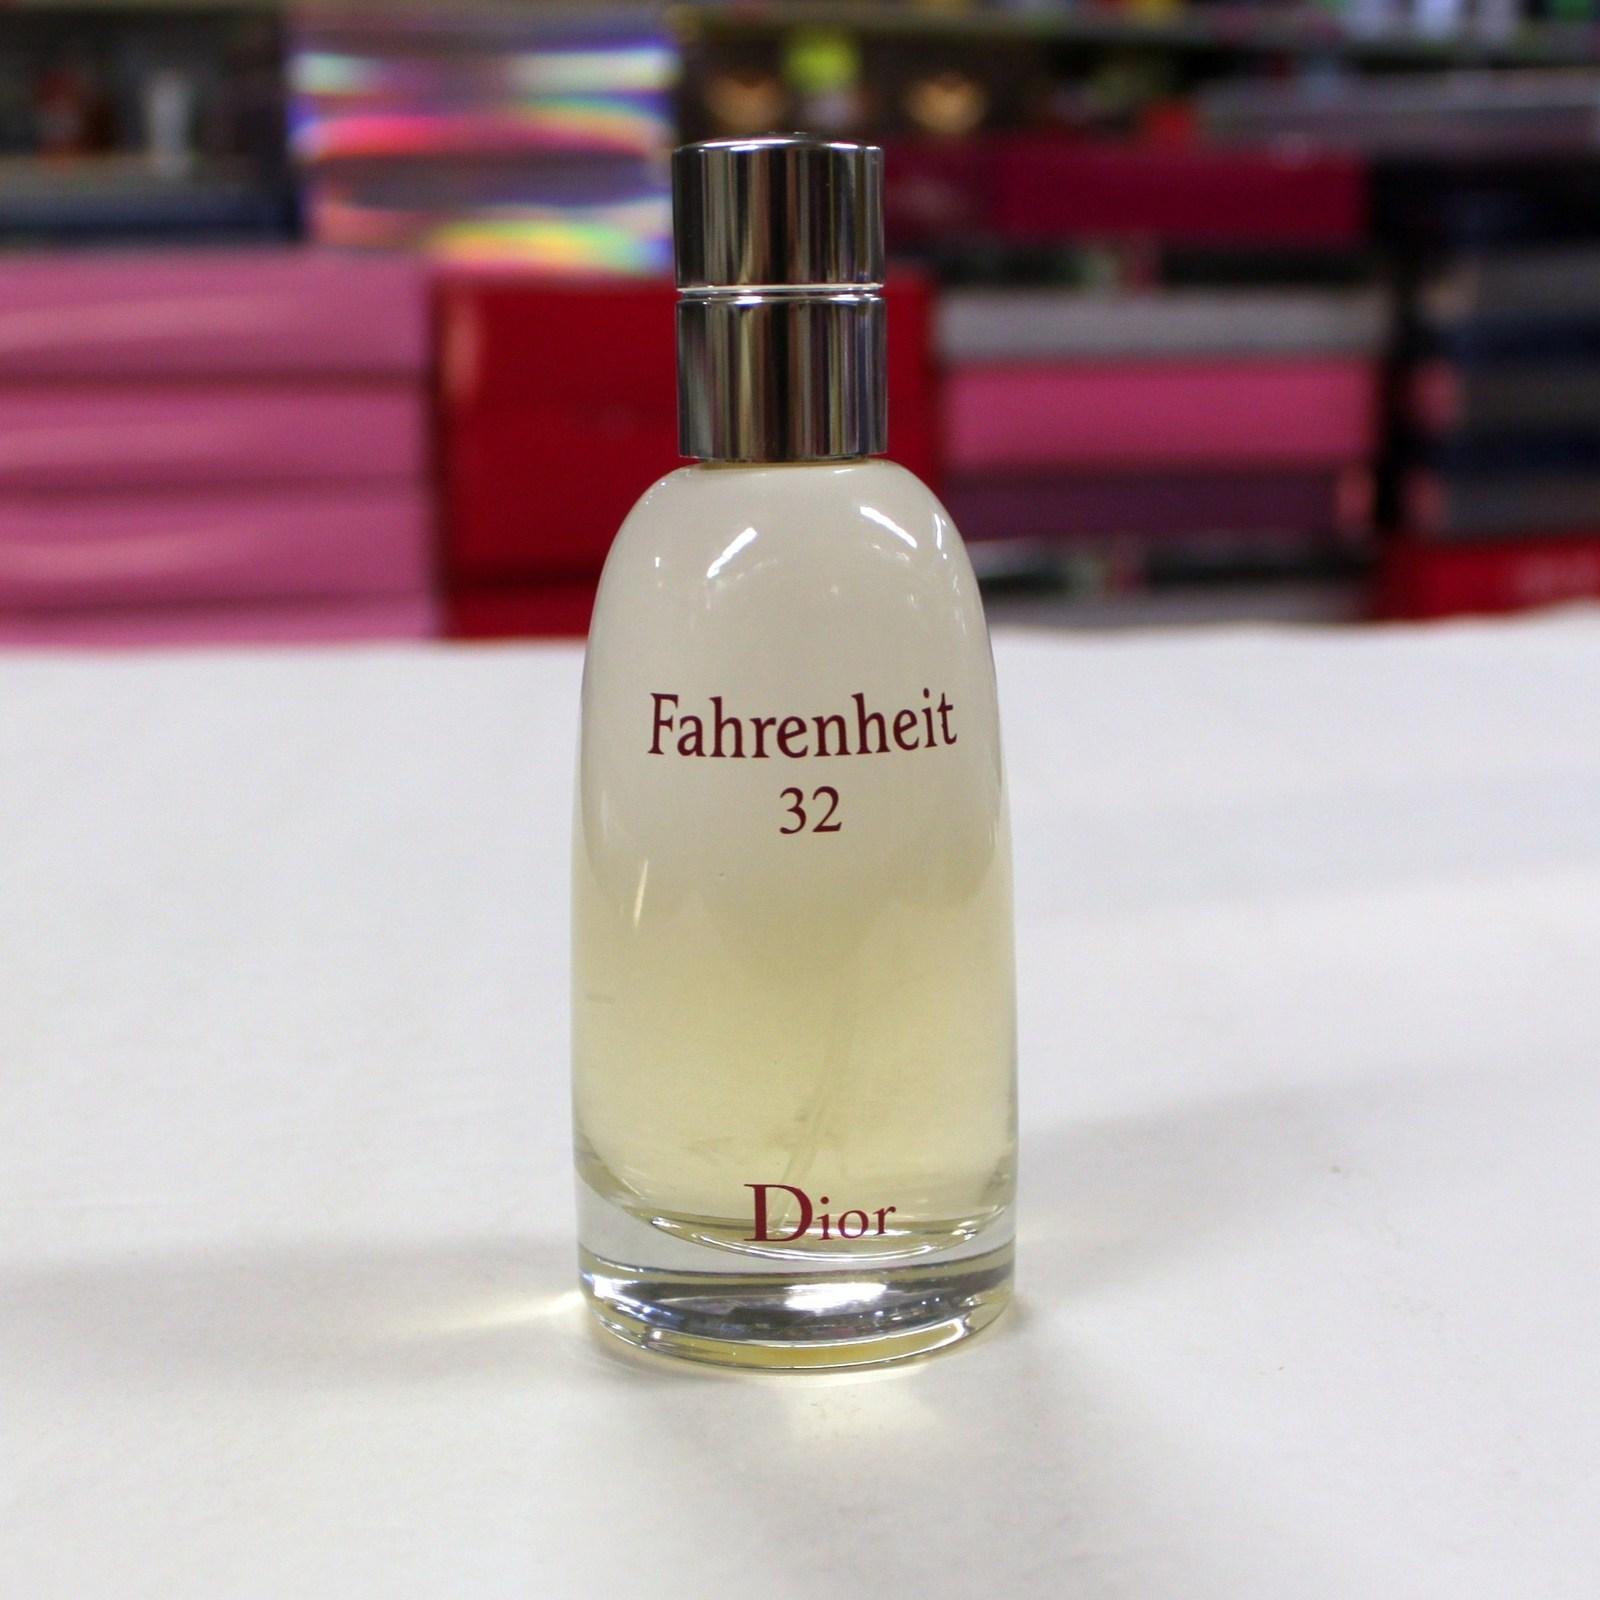 6c595db9 Fahrenheit 32 by Dior for Men 1.7 fl.oz / 50 and 50 similar items